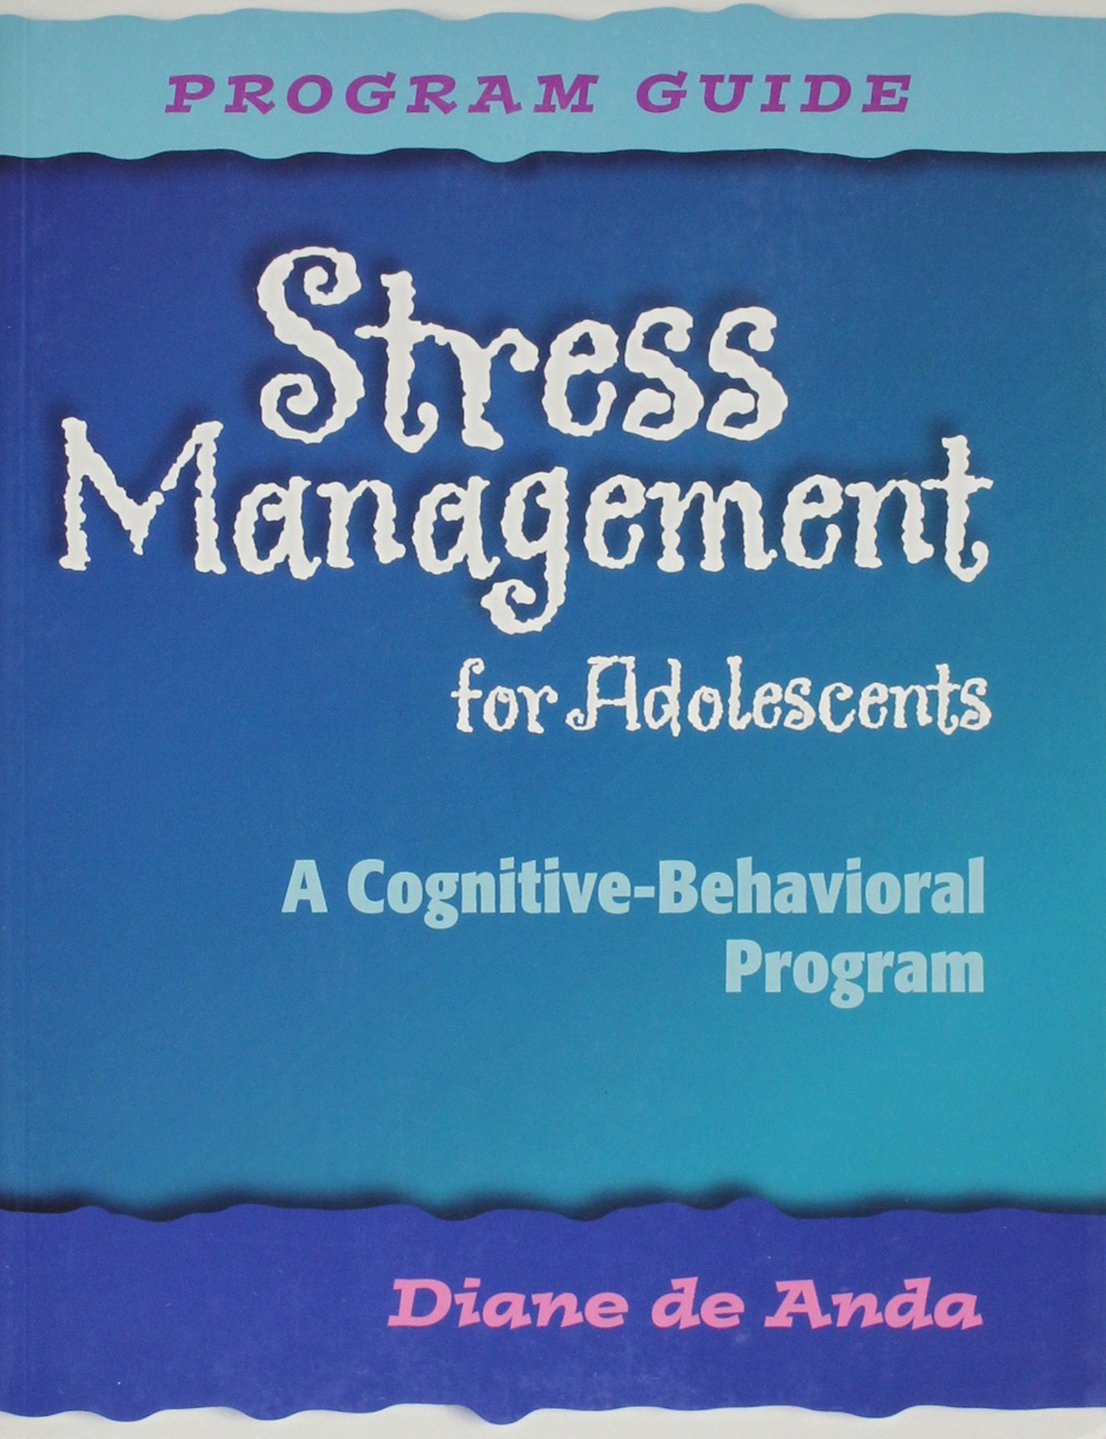 Stress Management for Adolescents: A Cognitive-Behavioral Program (Guide, CD and 5 Student Manuals) pdf